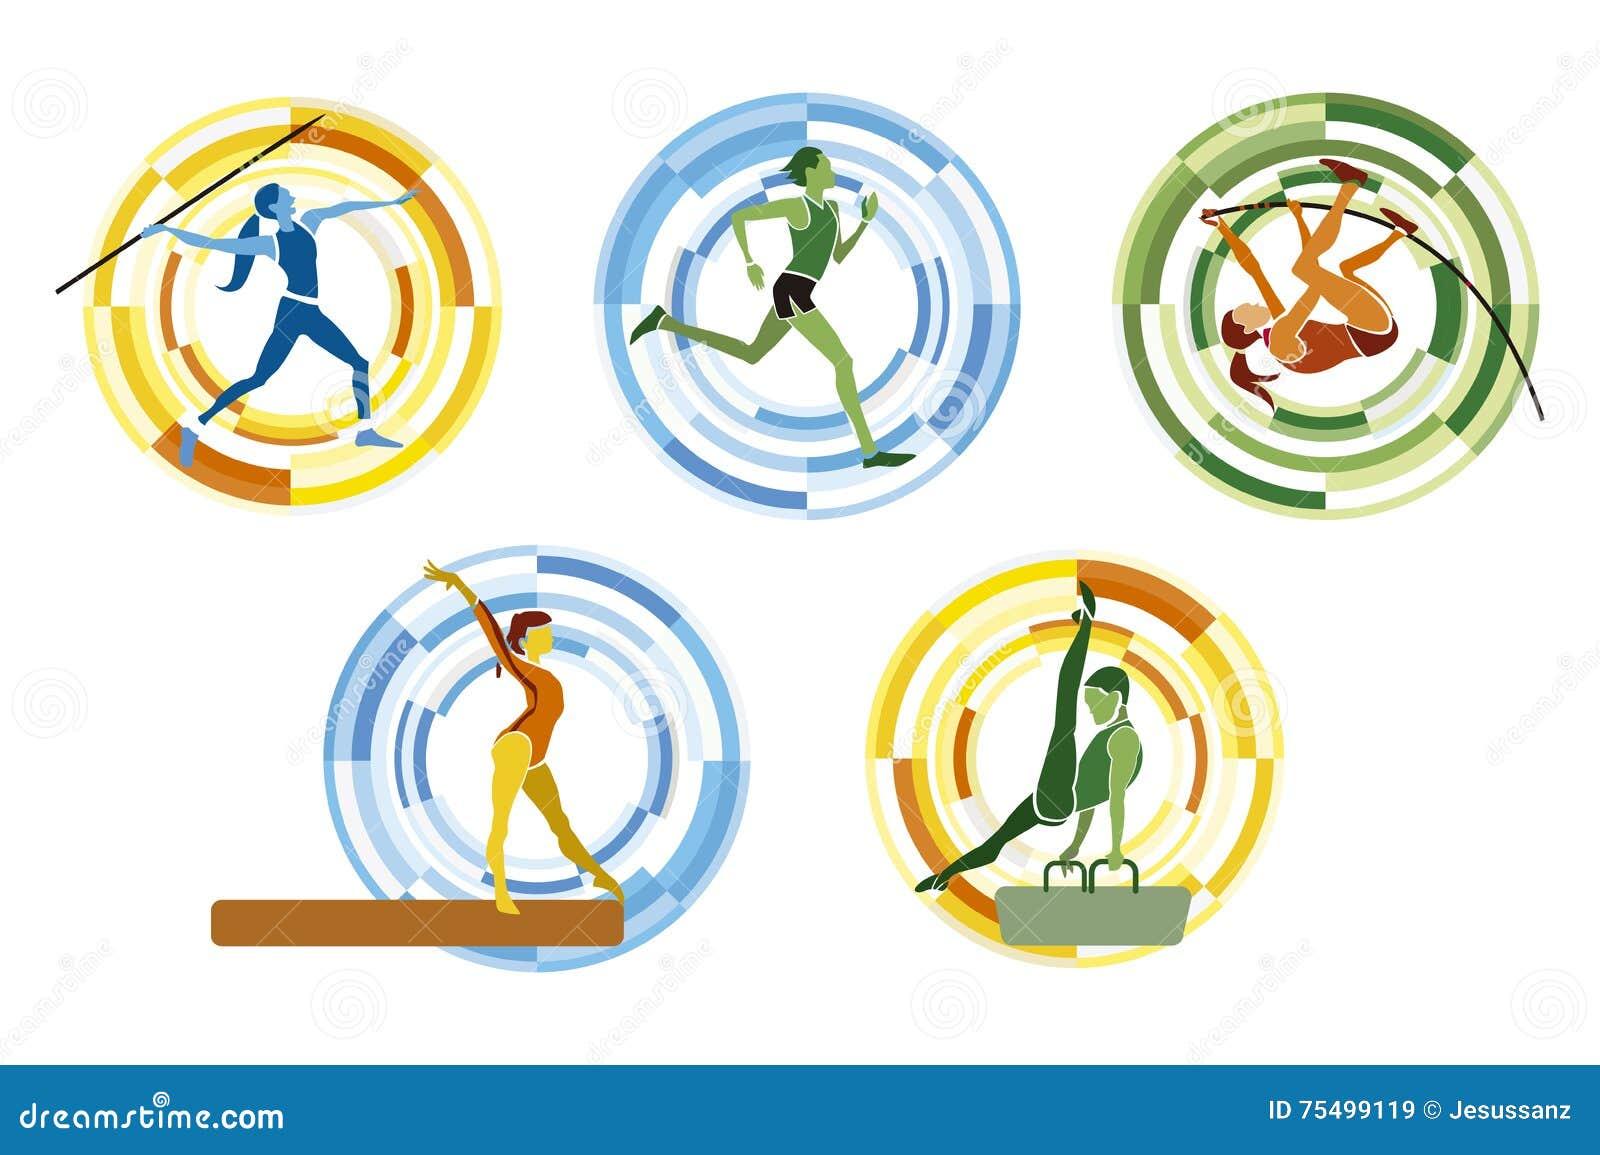 Olympic Disciplines